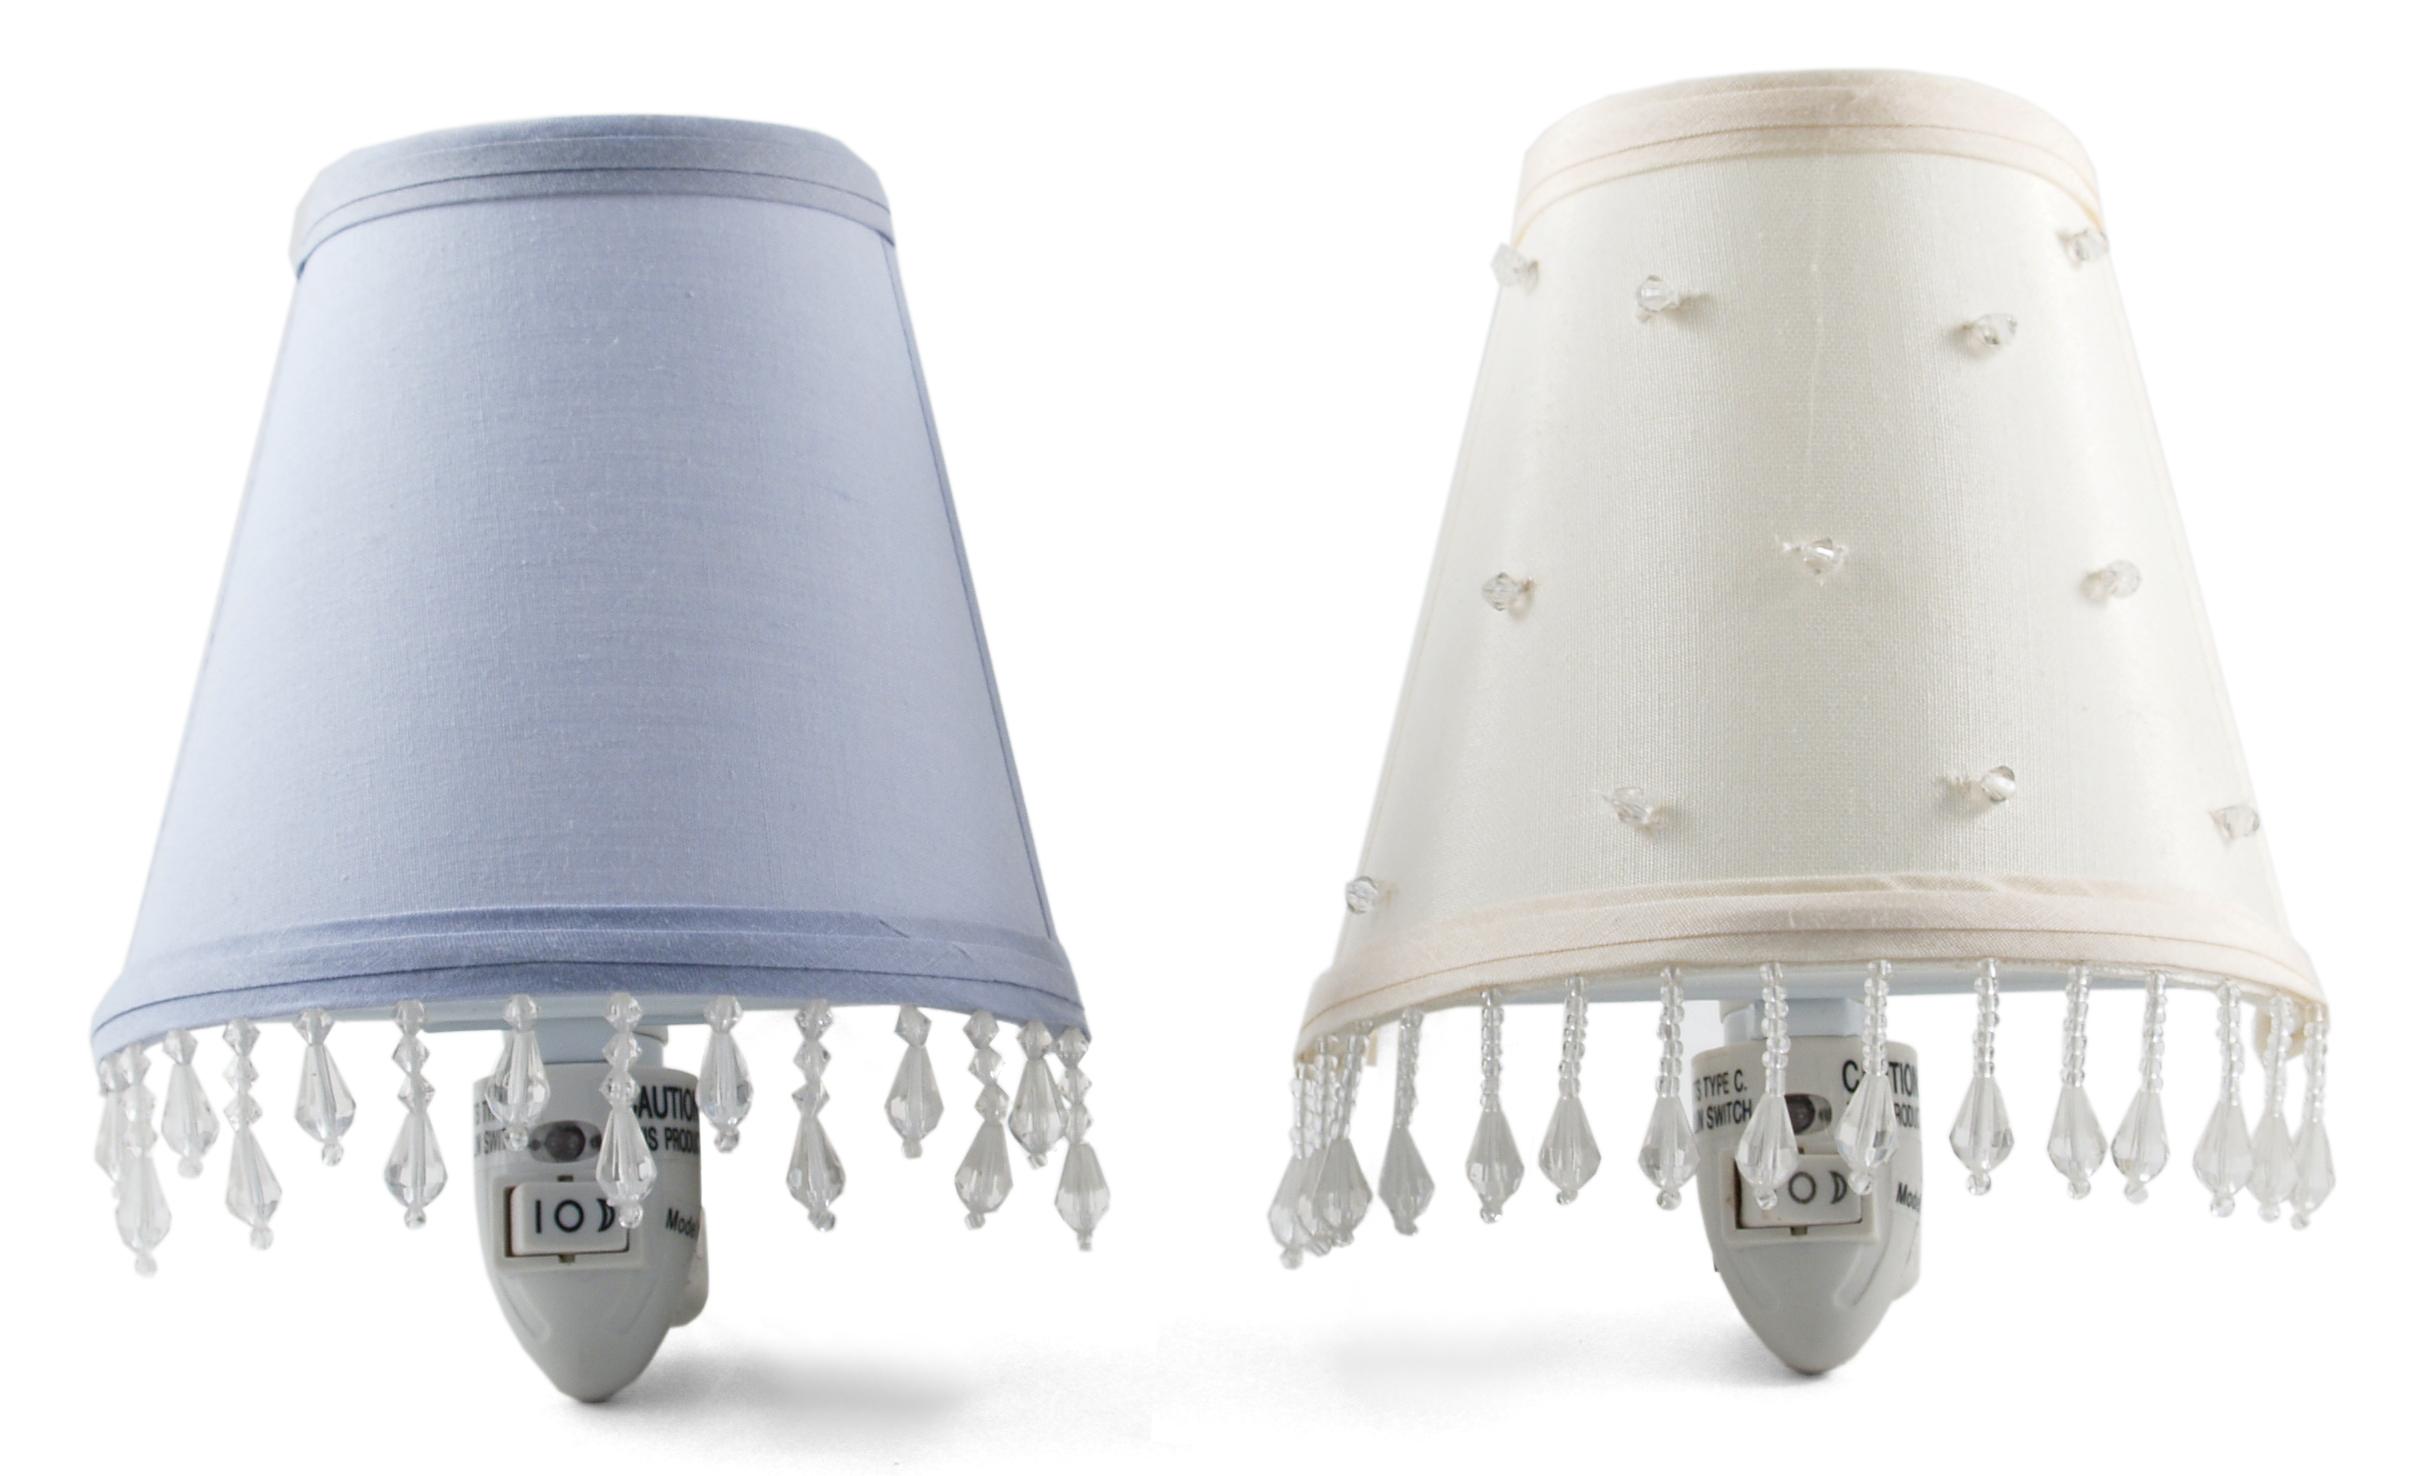 Ivory & Lavender Night Light, Set of 2